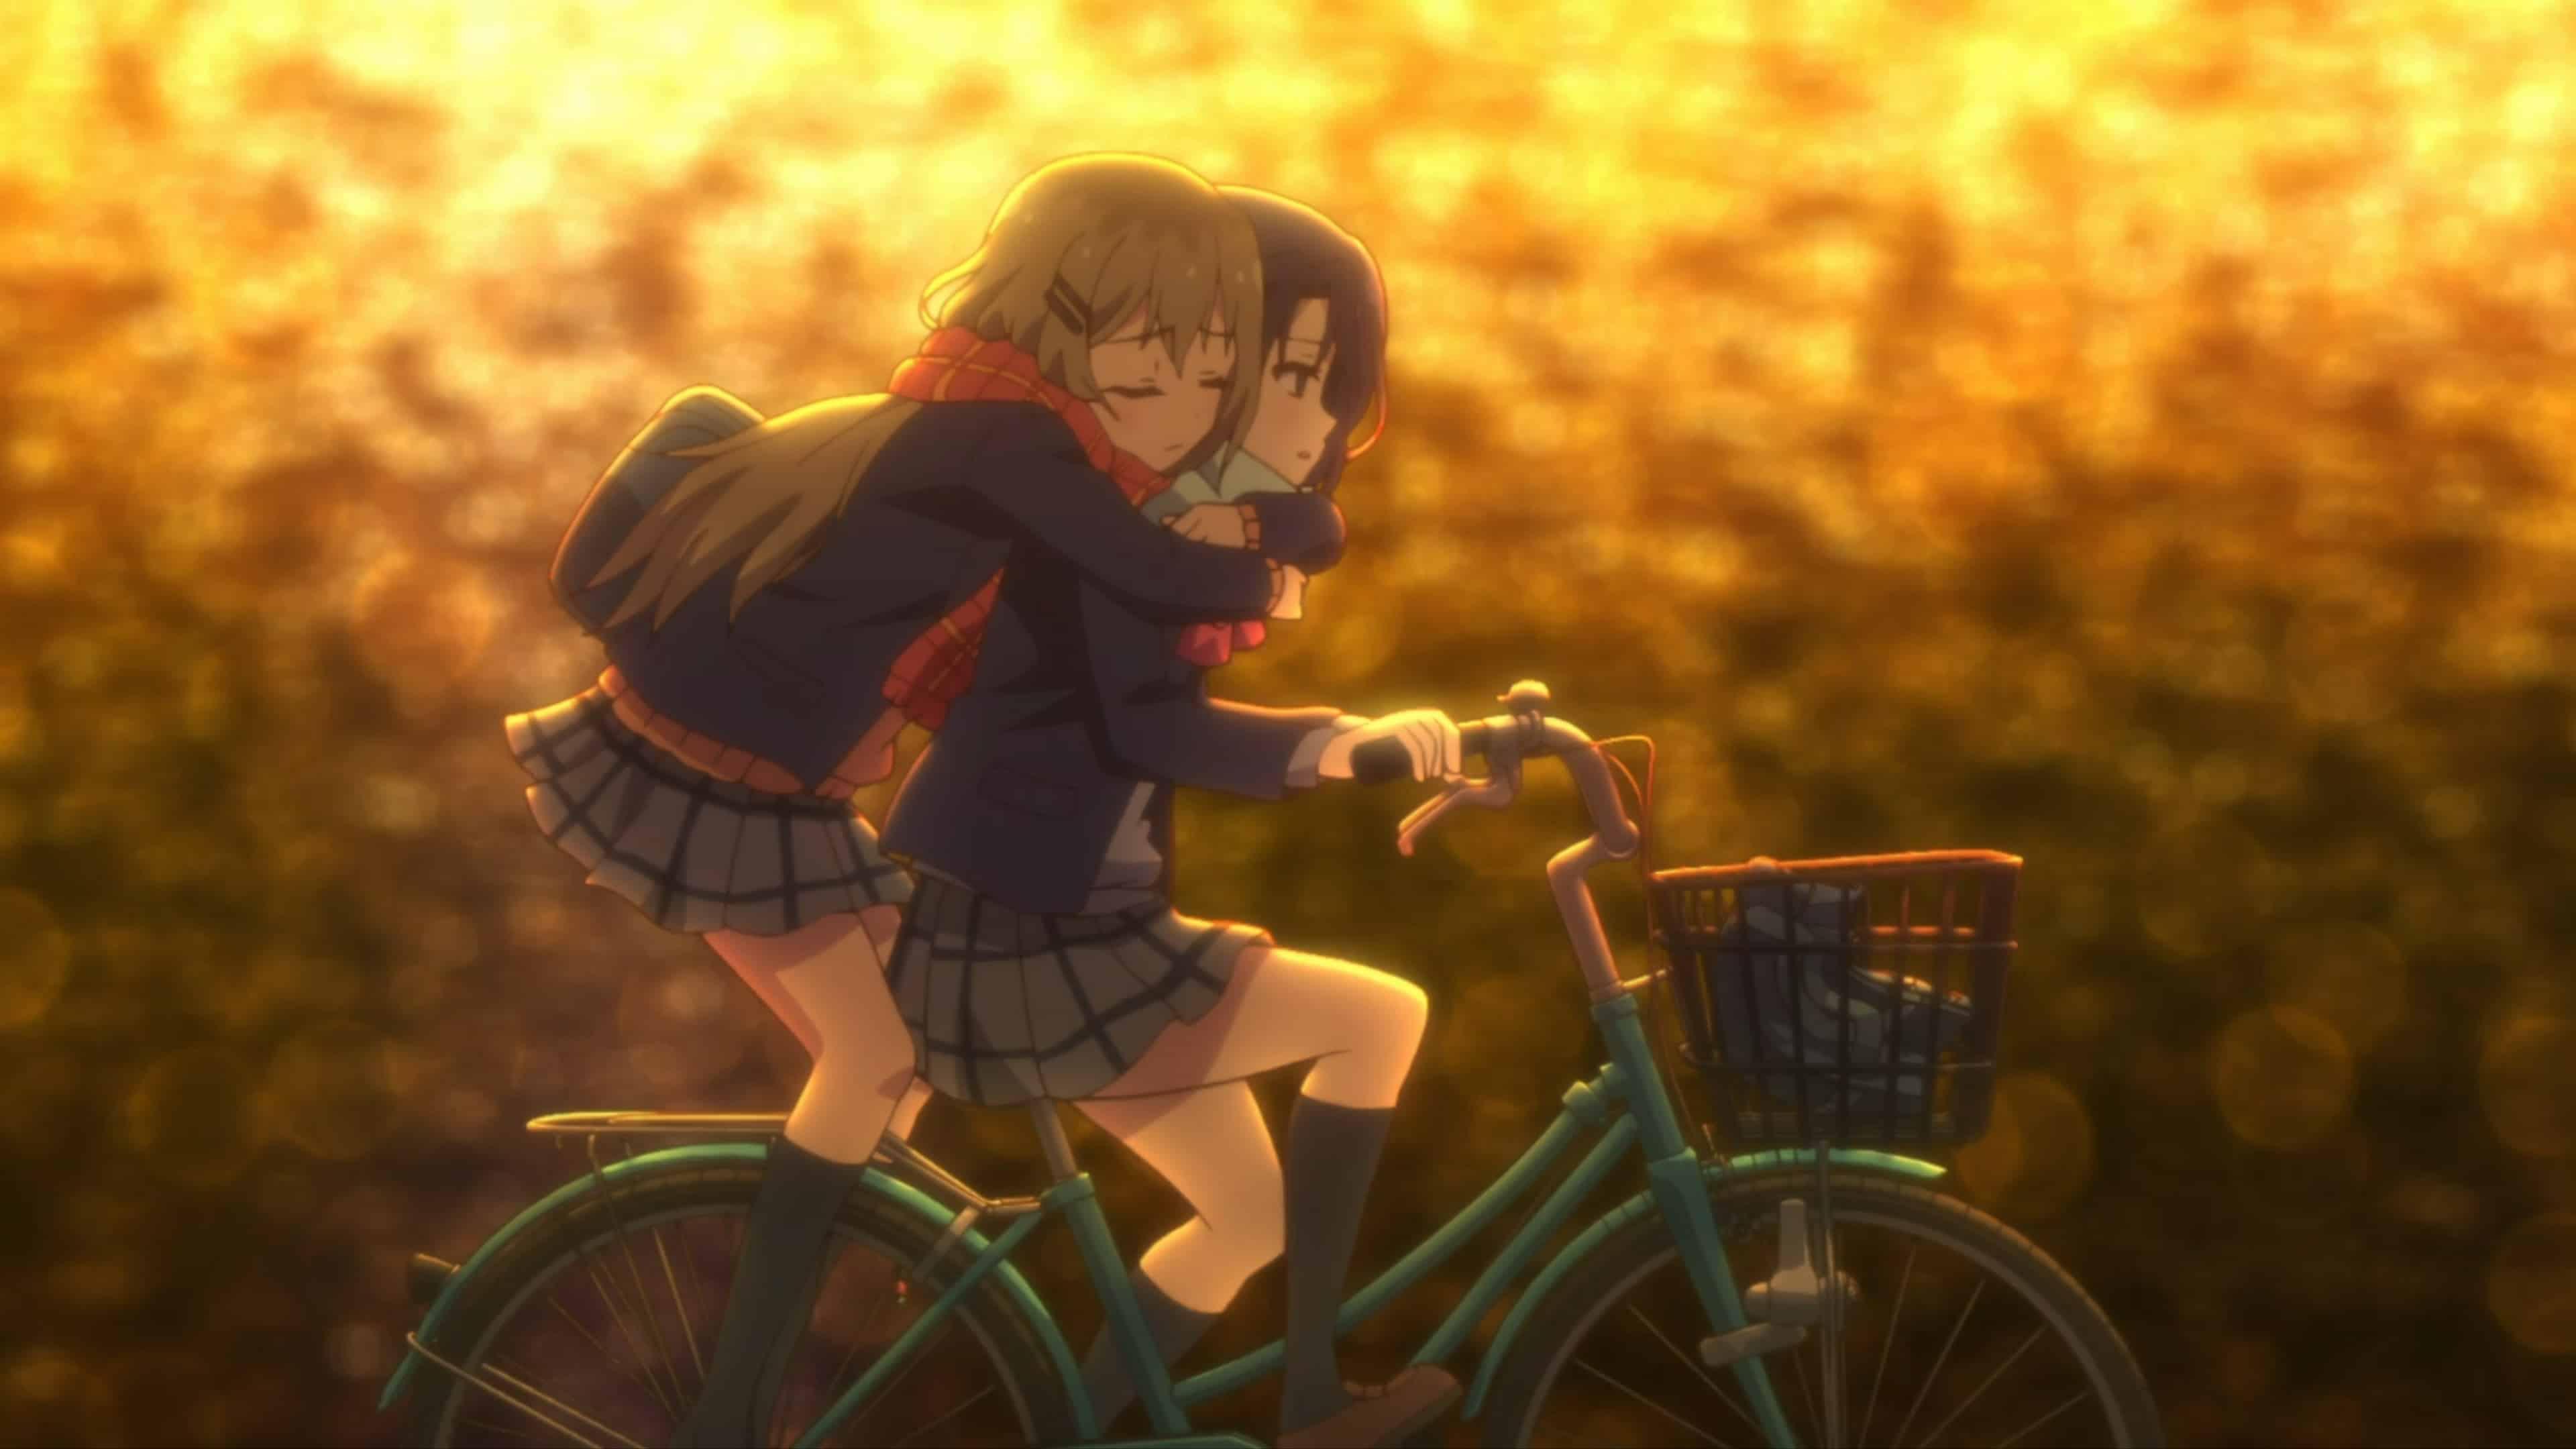 Shimamura on the back of Adachi's bike